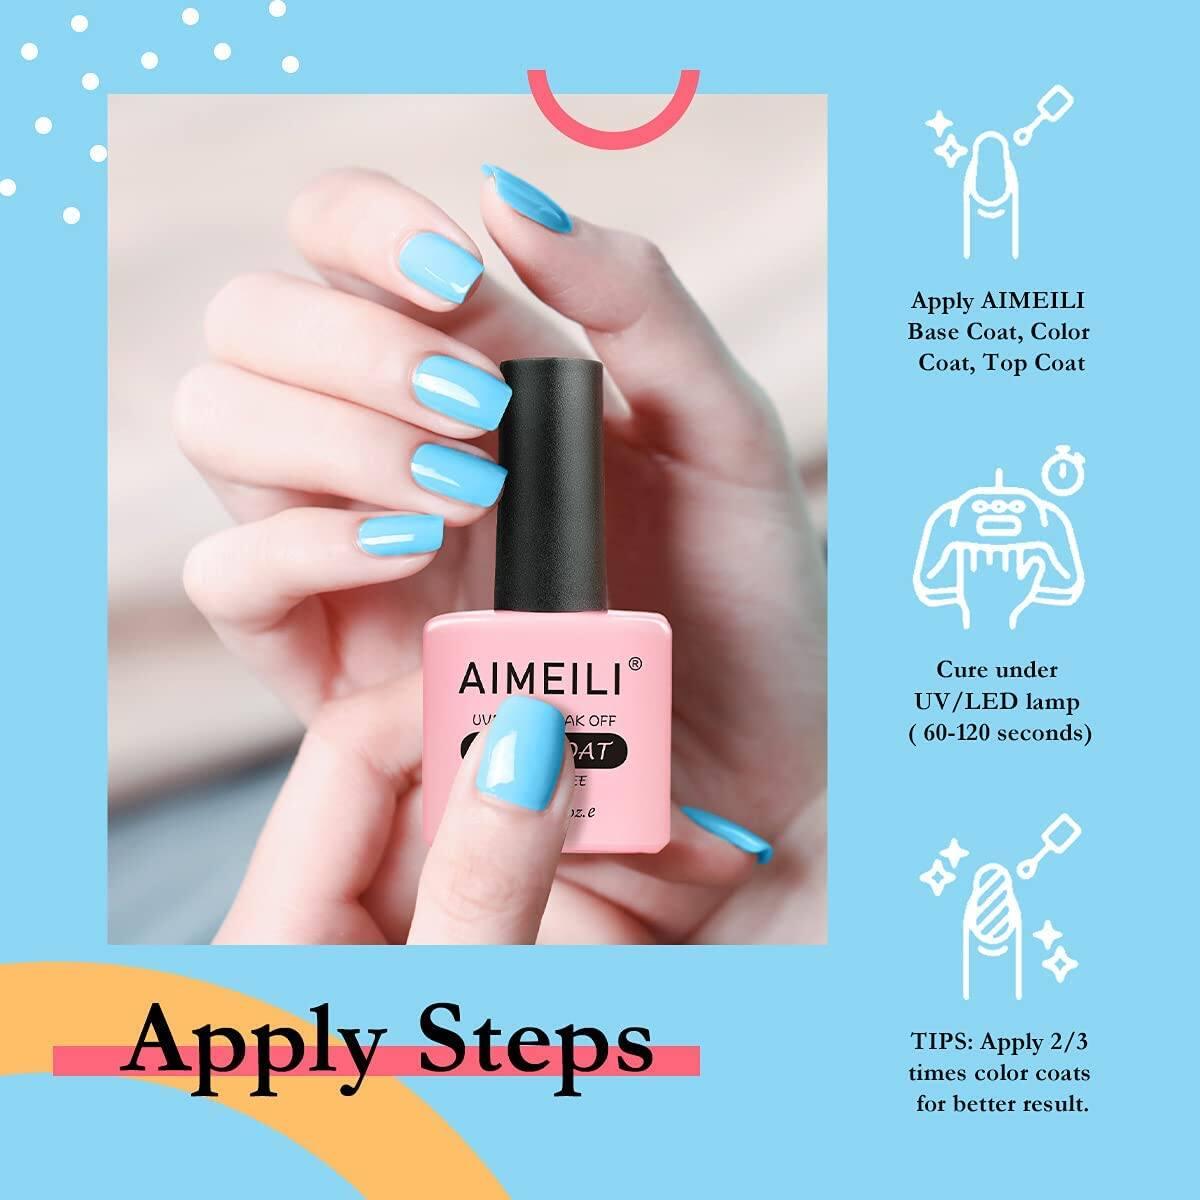 AIMEILI Gel Nail Polish No Wipe Top and Base Coat Set - 2 x 15ml - $4.99 + Free Shipping w/ Amazon Prime or Orders $25+